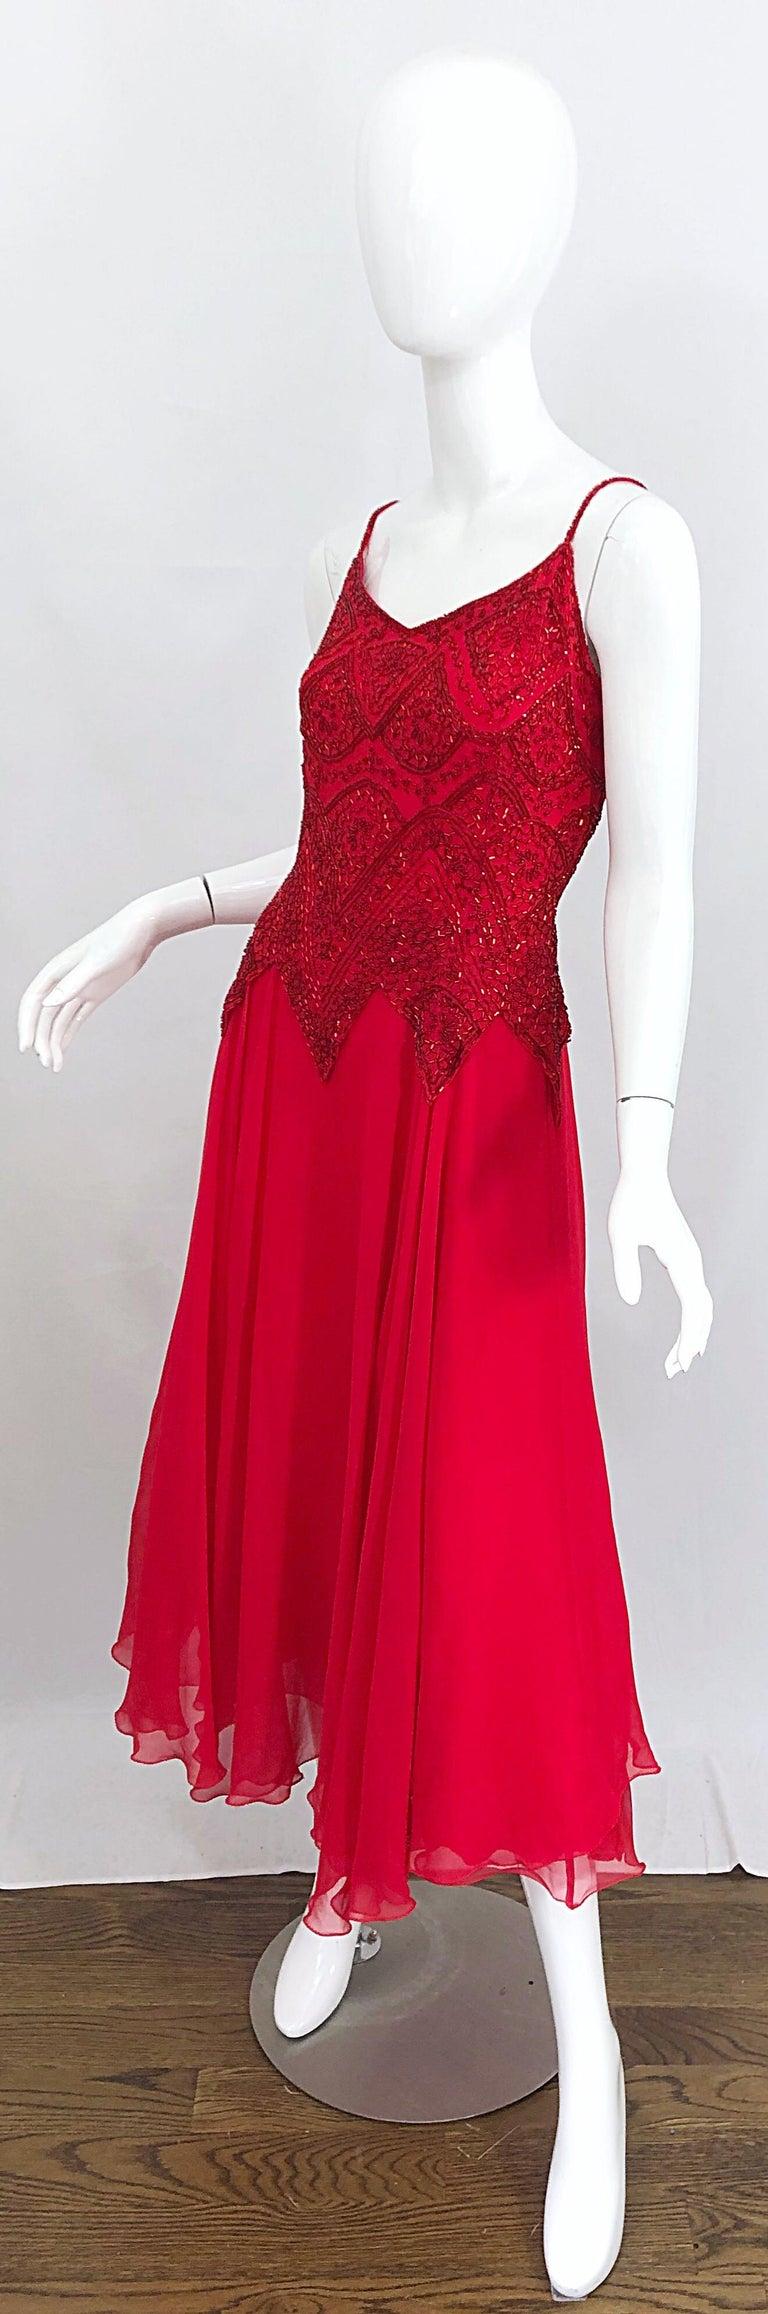 1970s Oleg Cassini Size 10 / 12 Red Silk Chiffon Beaded Handkerchief Midi Dress For Sale 6